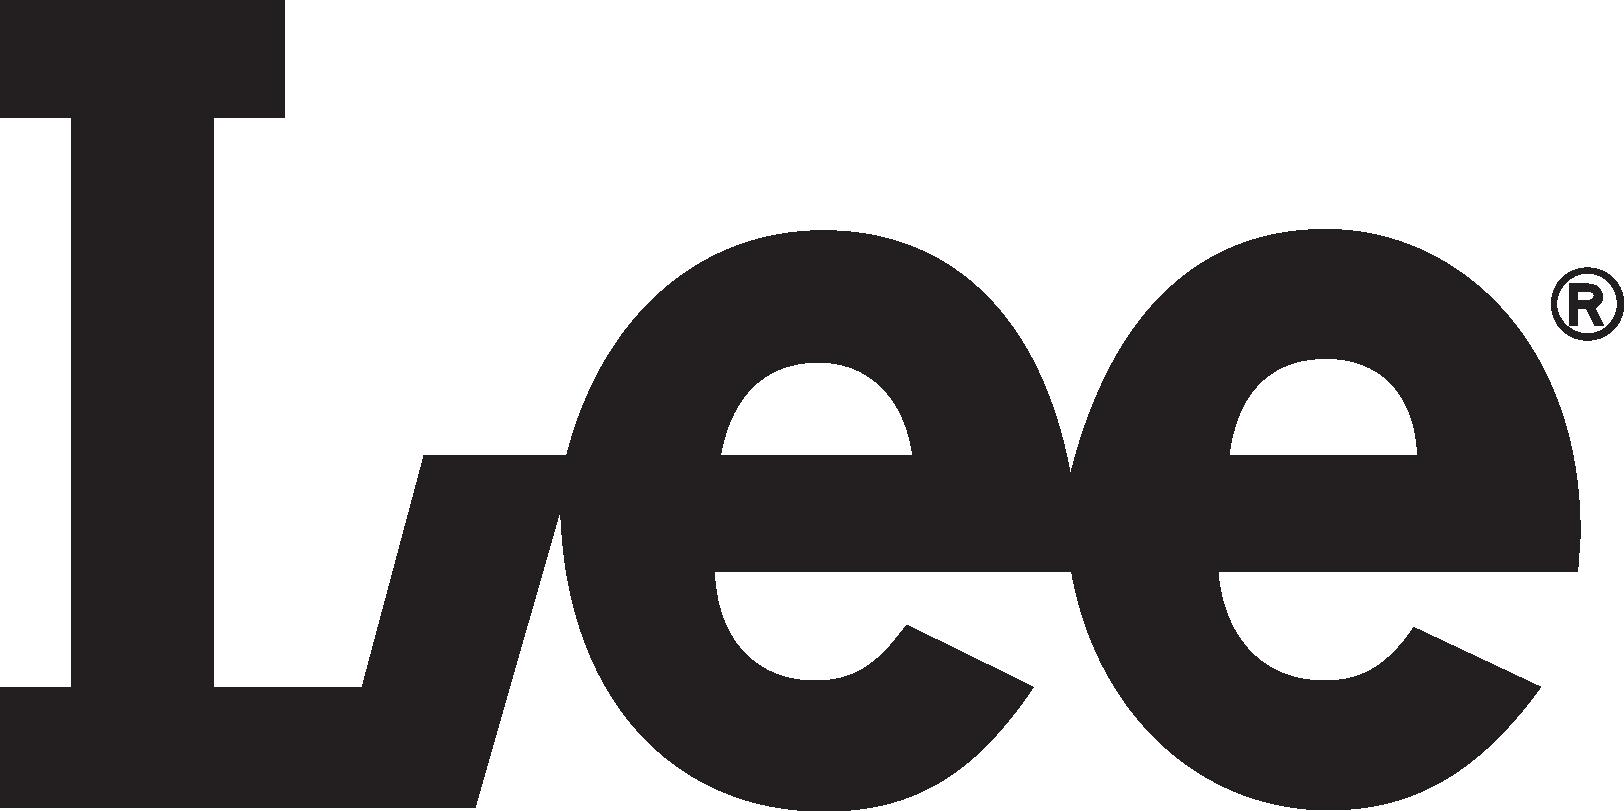 Lee Logo [Jeans] Download Vector.